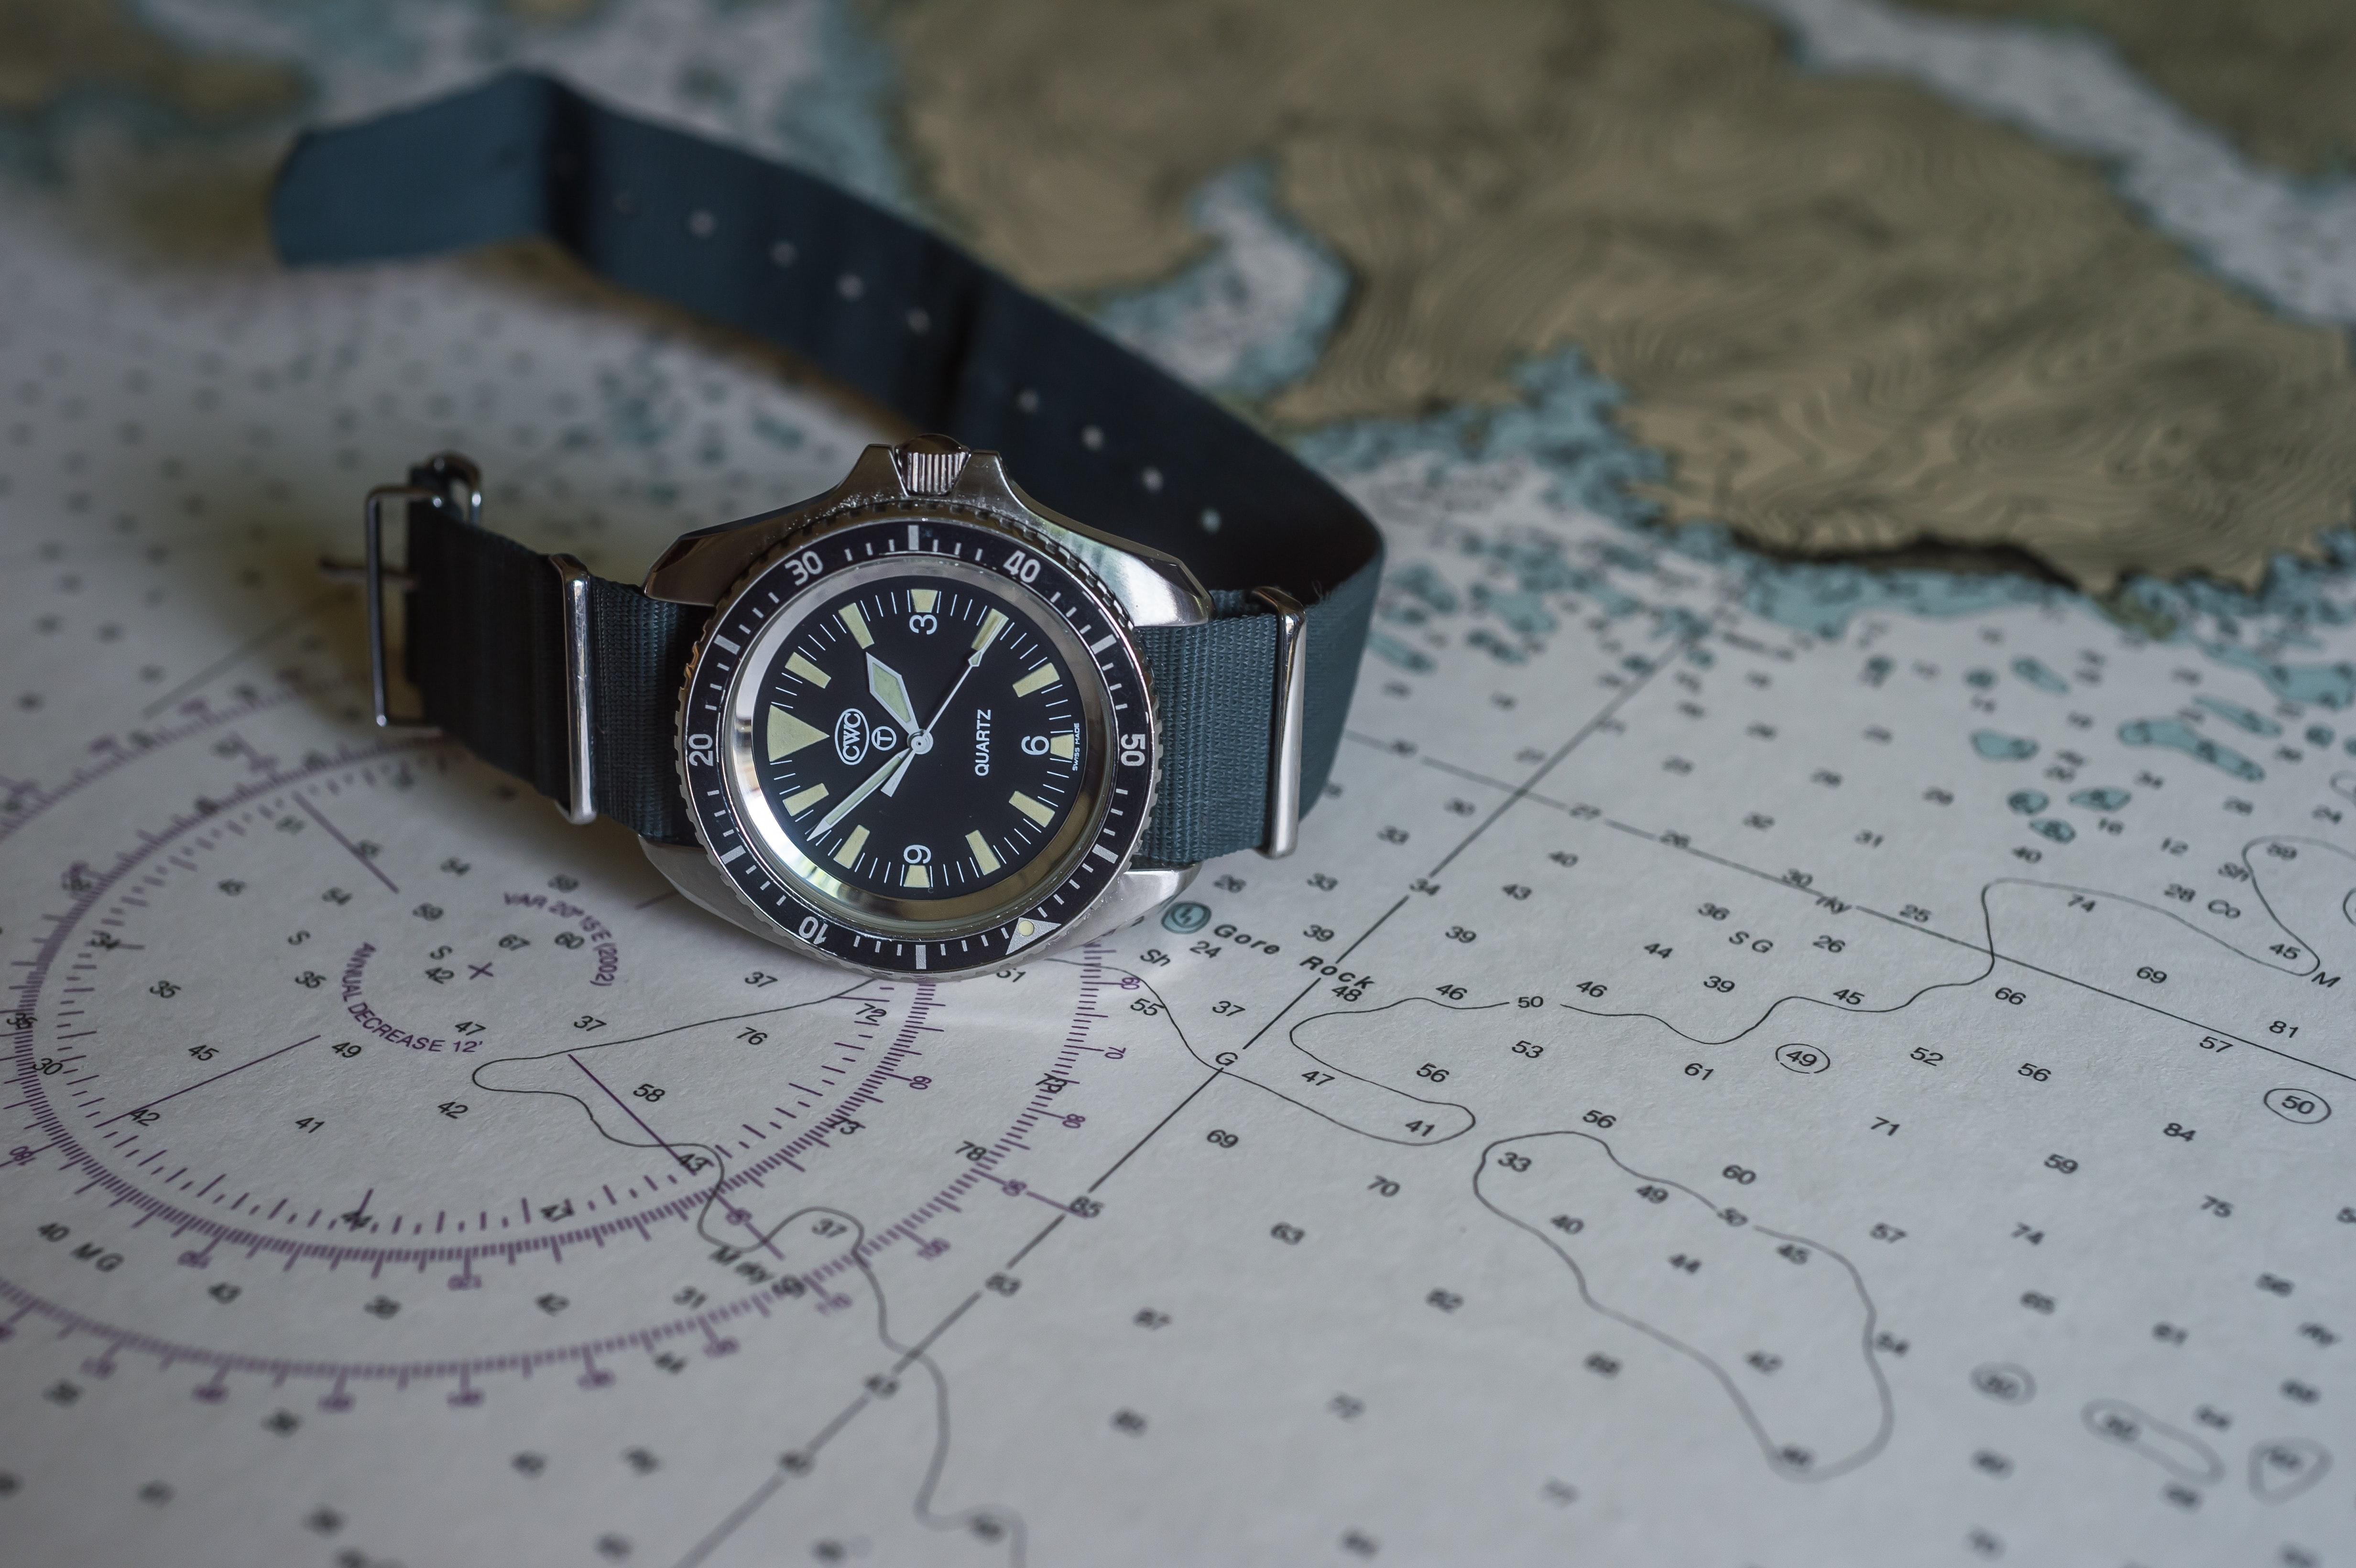 quartz cwc dive watch